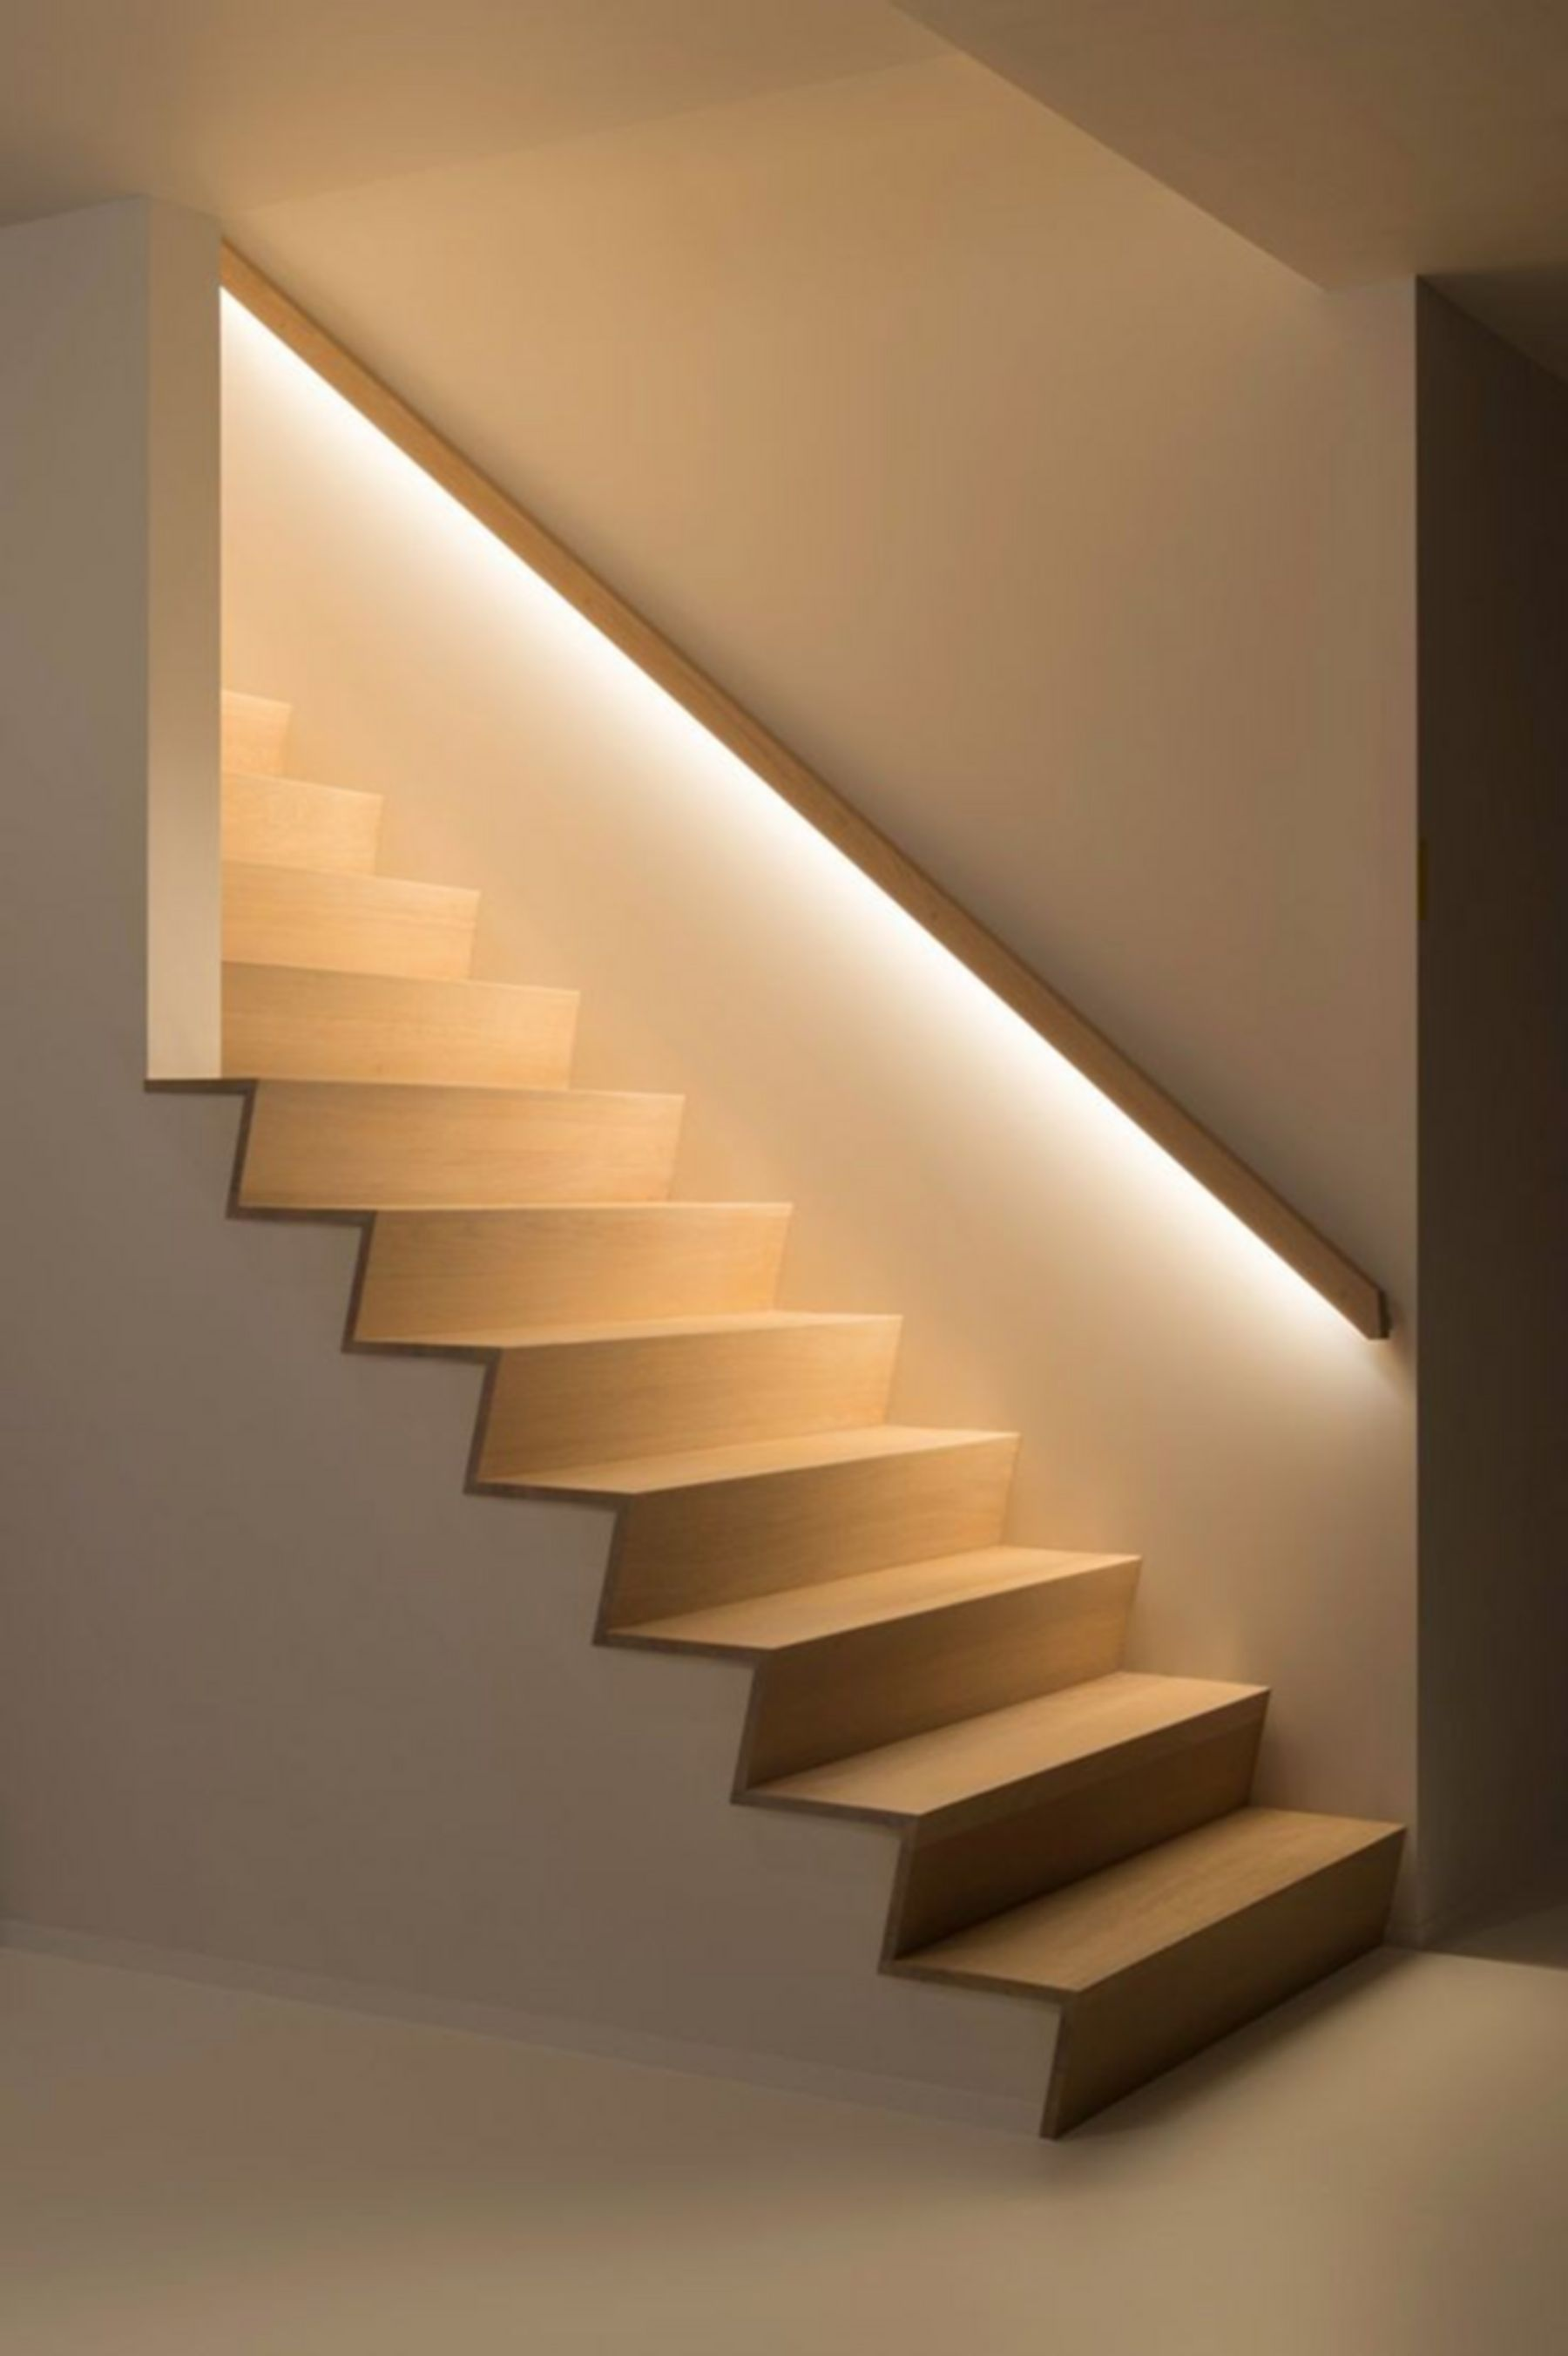 Lighting Basement Washroom Stairs: Interesting 8 Indoor Staircase Lighting Design Ideas For